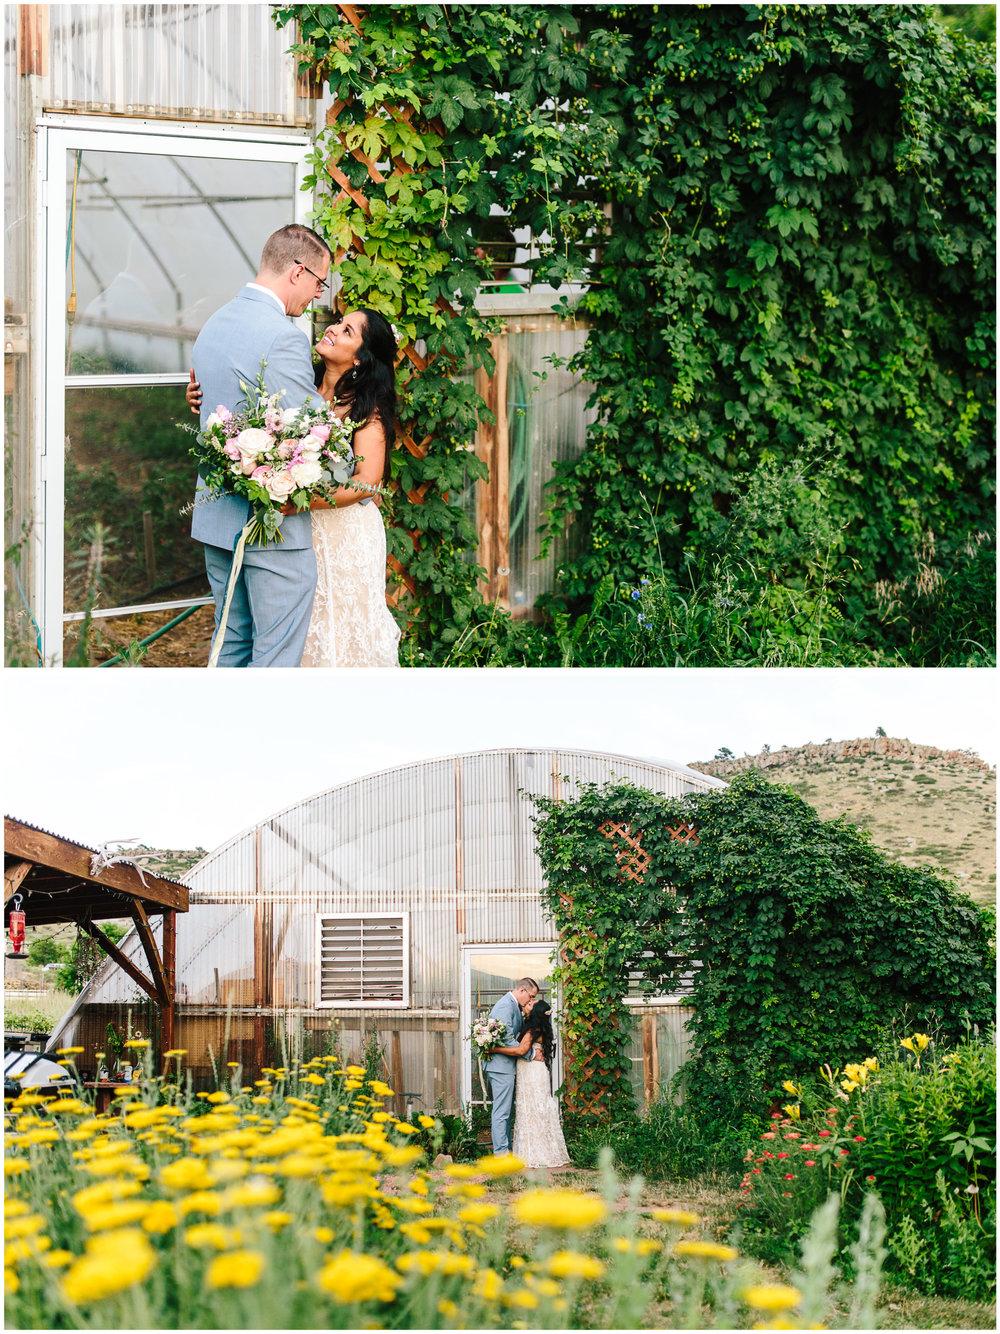 lyons_farmette_wedding_54.jpg